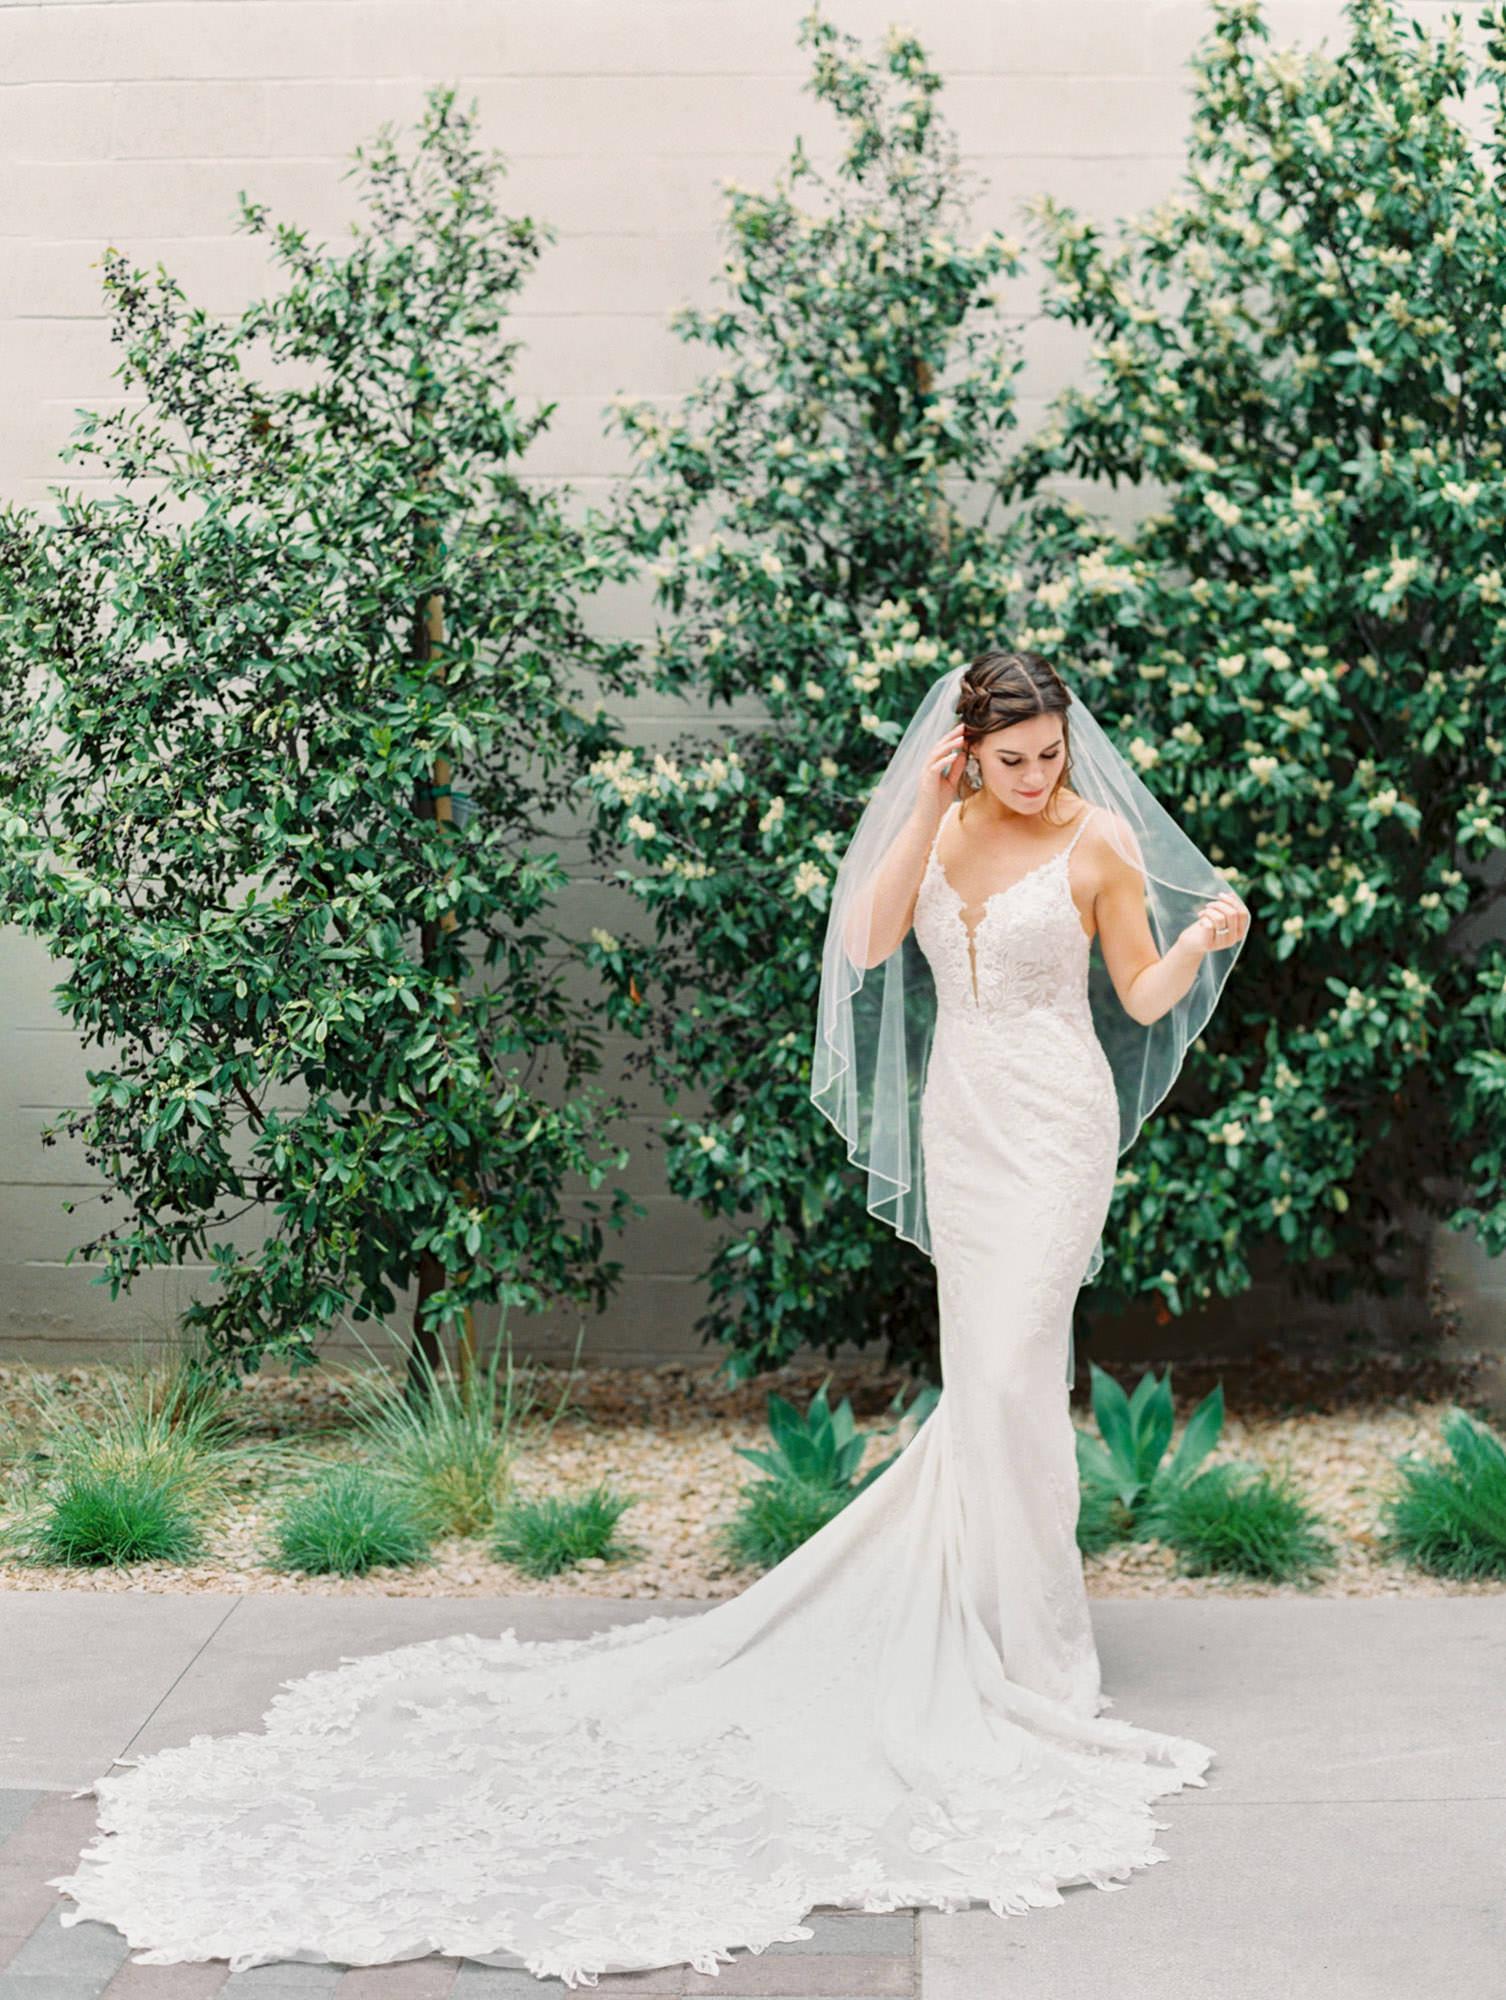 1165 floral beaded and crepe dramatic train Martina Liana wedding dress in San Diego by Cavin Elizabeth - San Diego film photographer